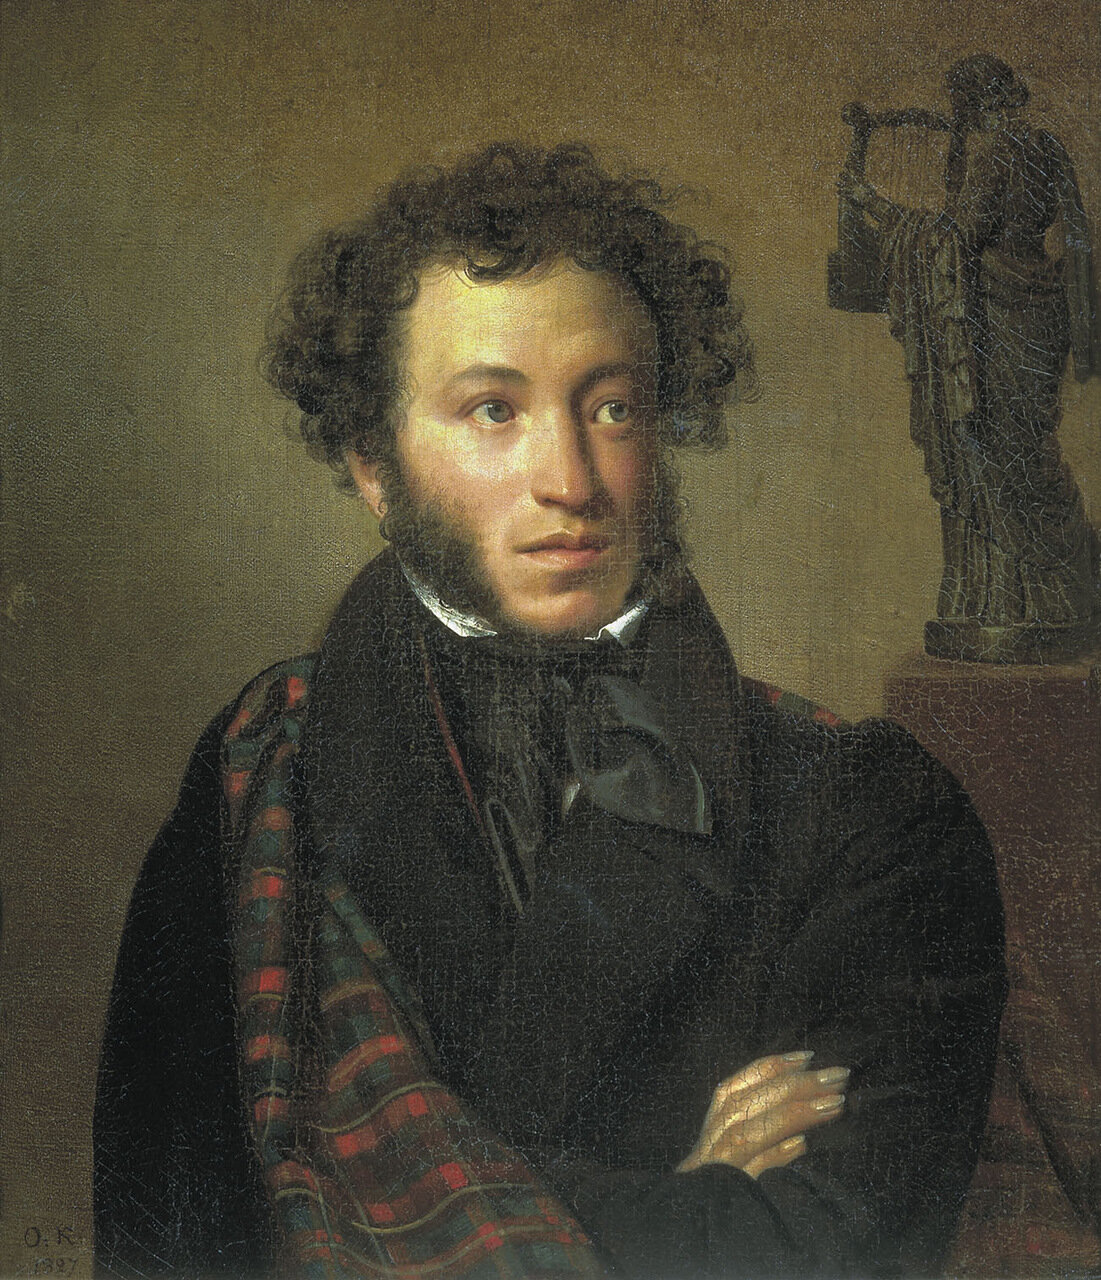 Портрет поэта Александра Сергеевича Пушкина. 1827.jpg